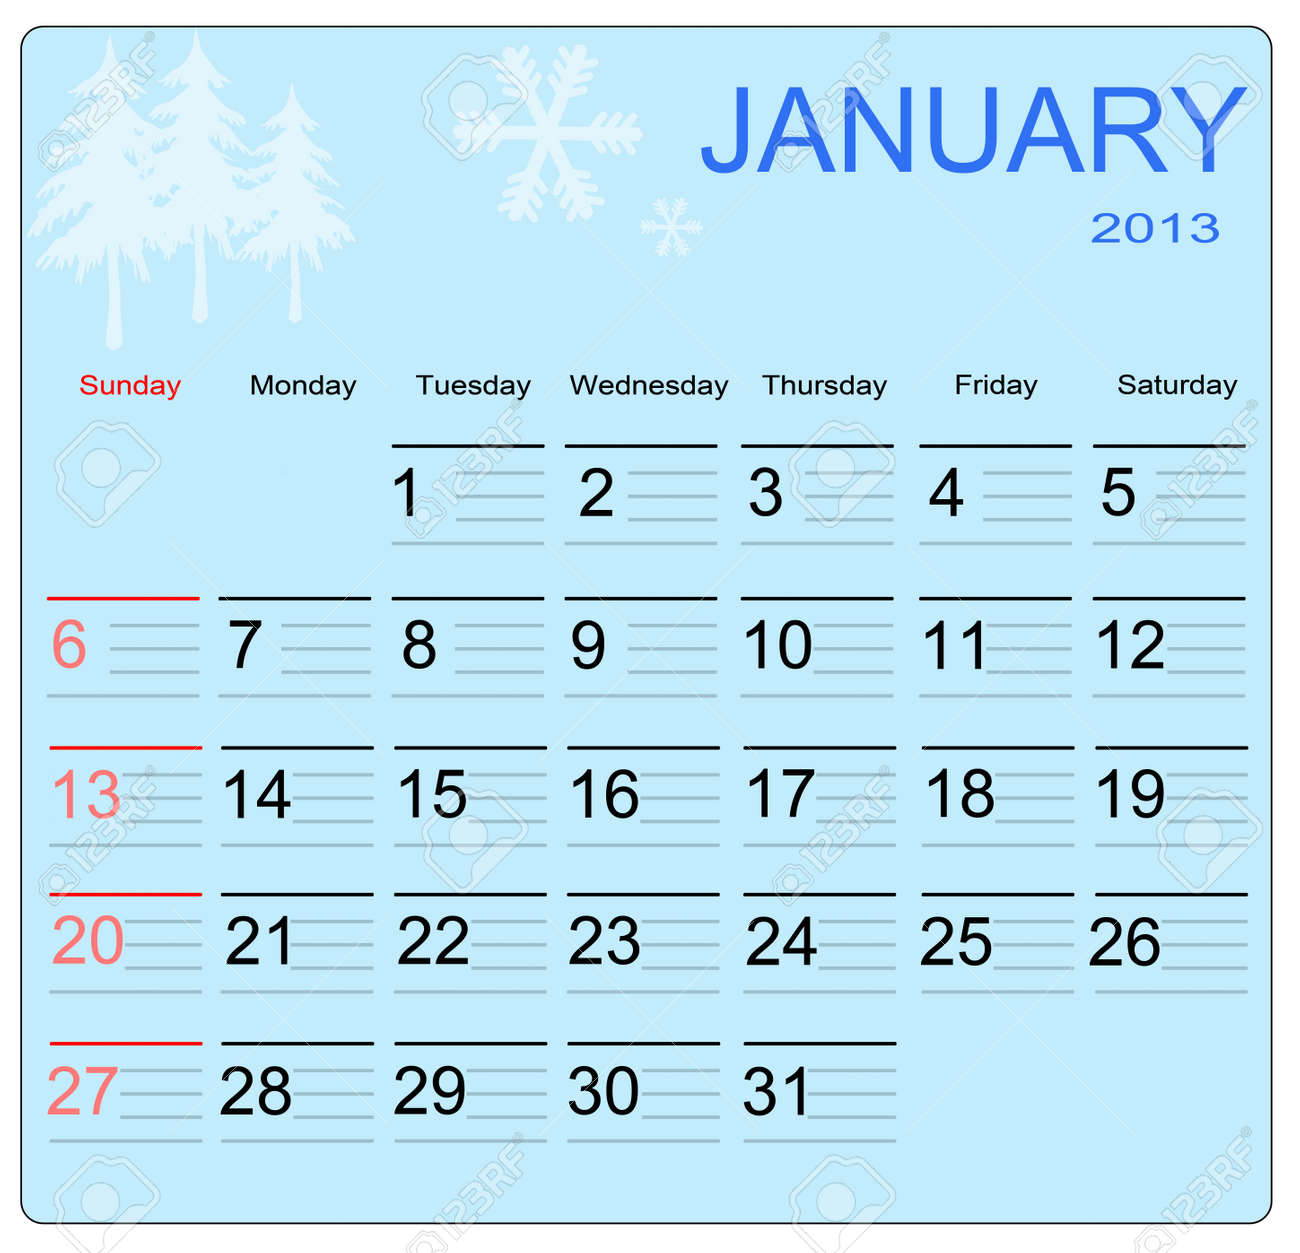 January 2013 calendar, vector illustration Stock Vector - 15207663